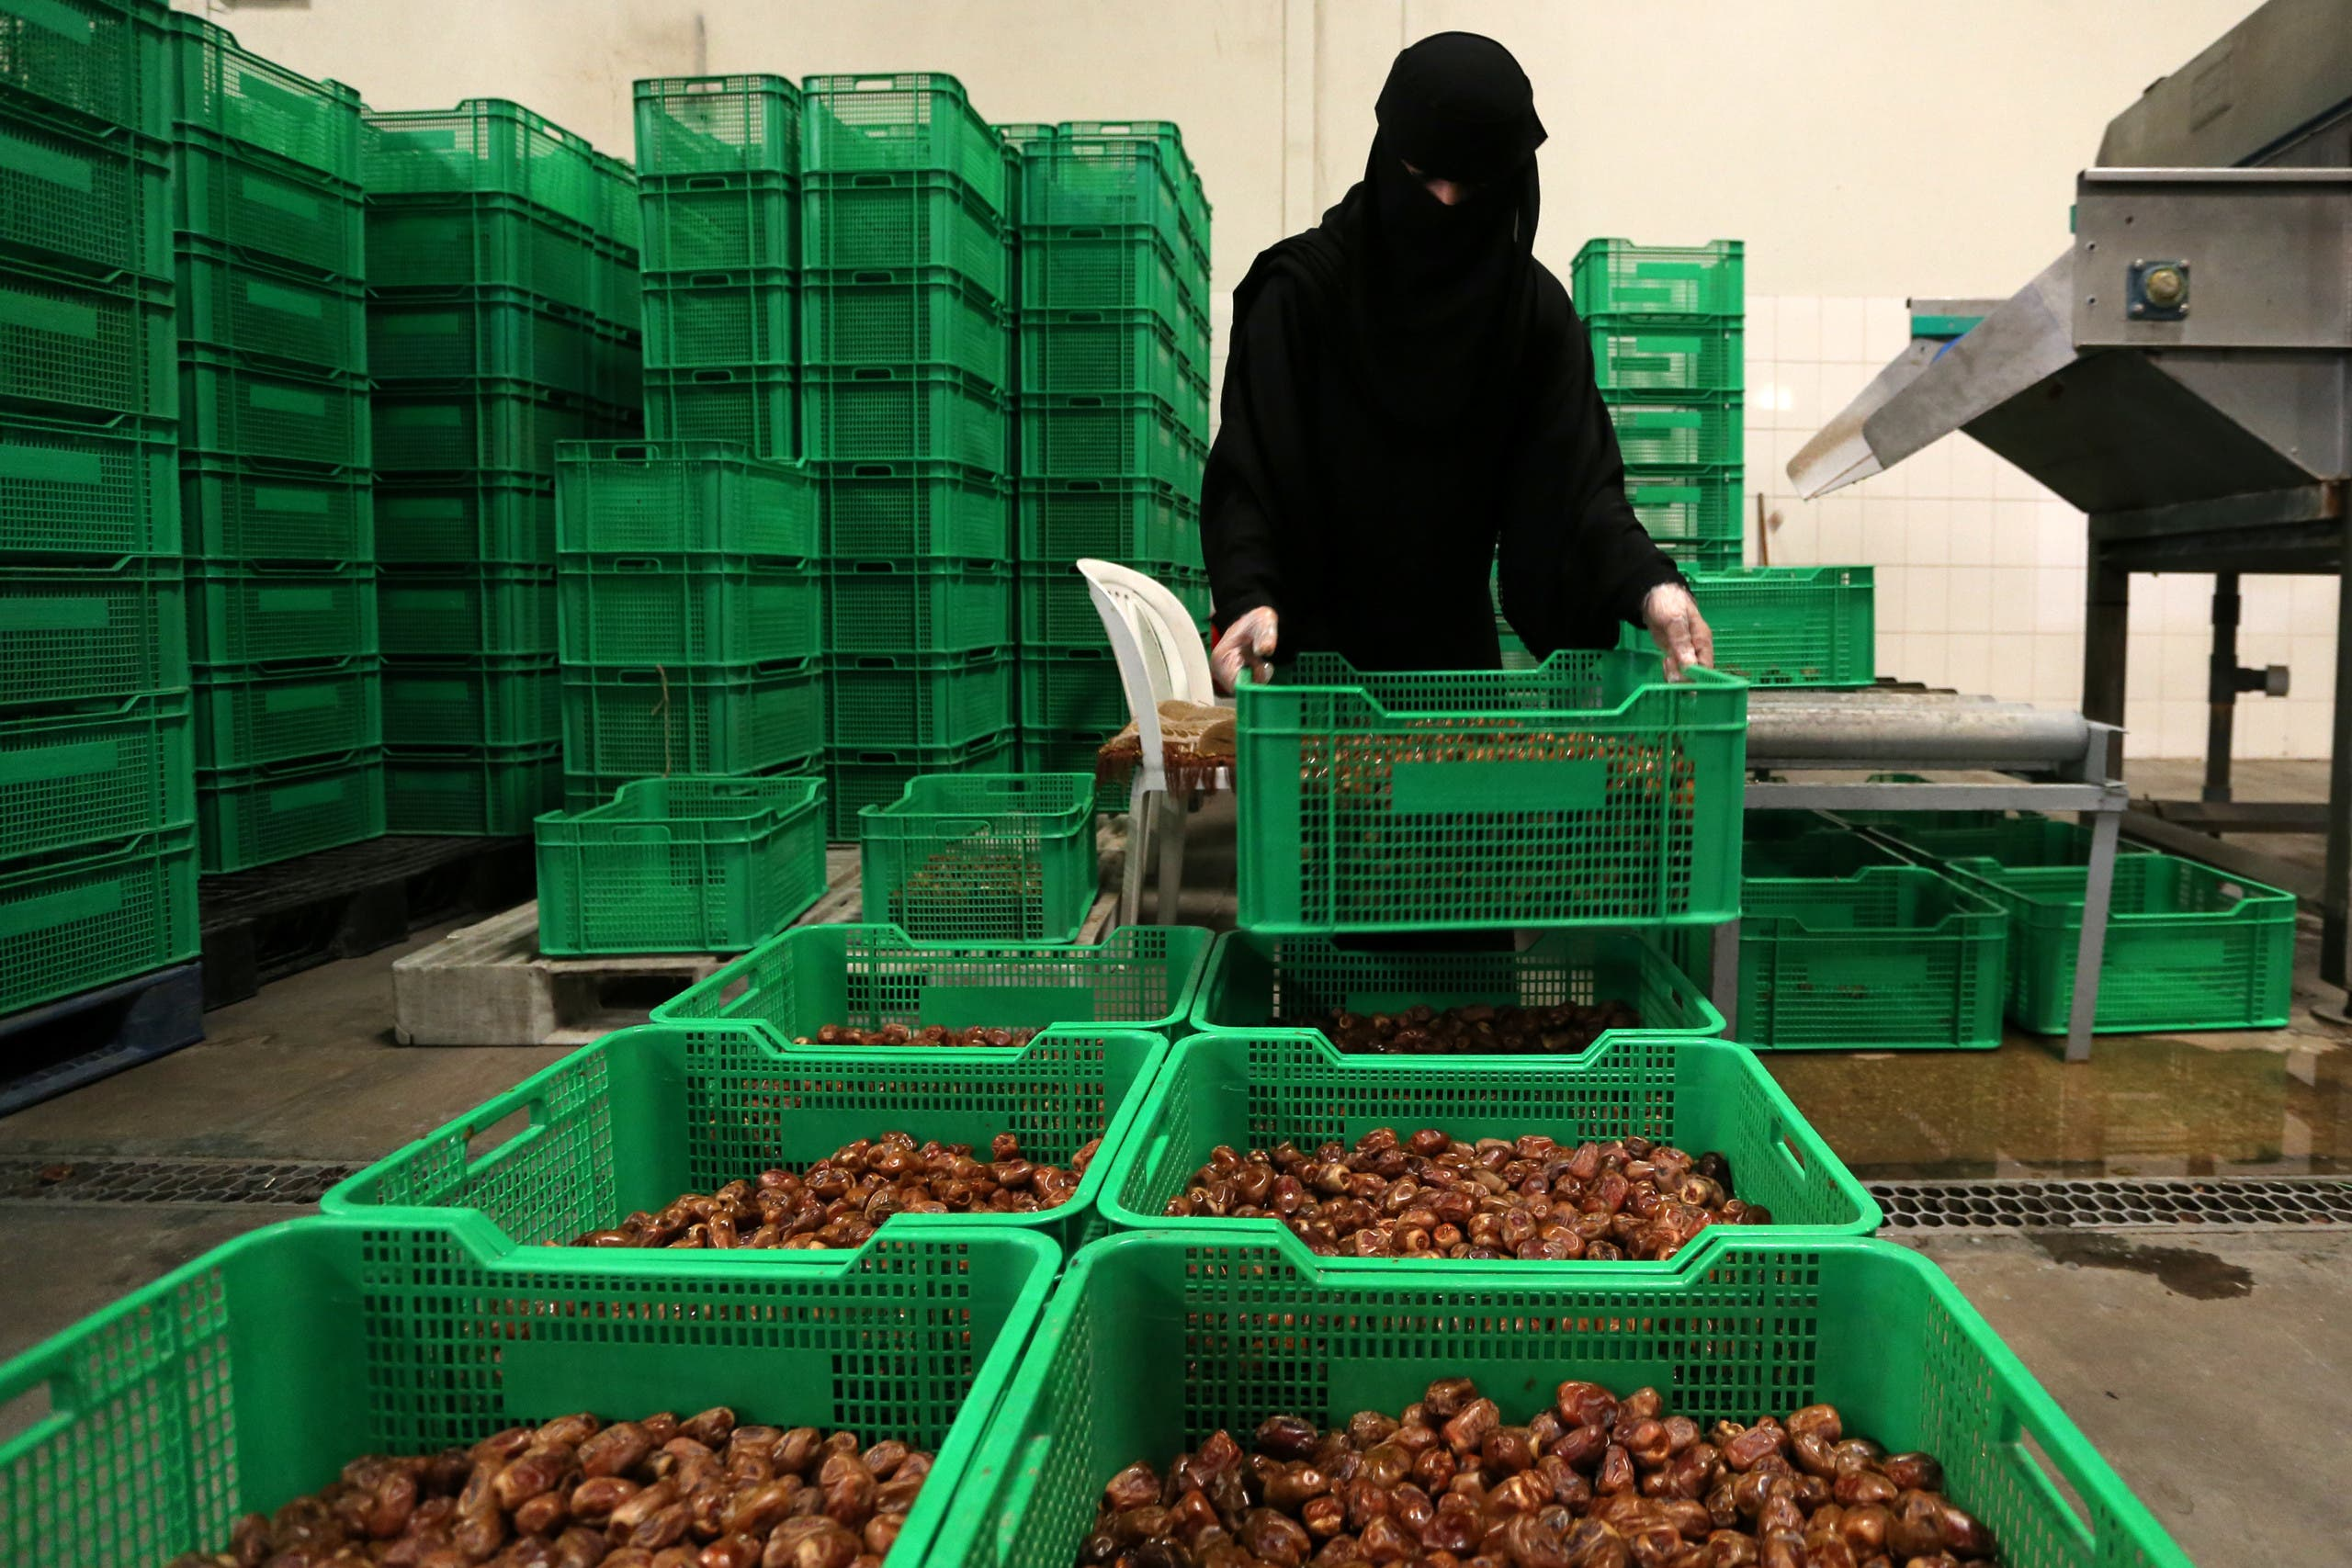 A Saudi woman works at a dates packaging factory in Al-Ahsa, Saudi Arabia. (Reuters)